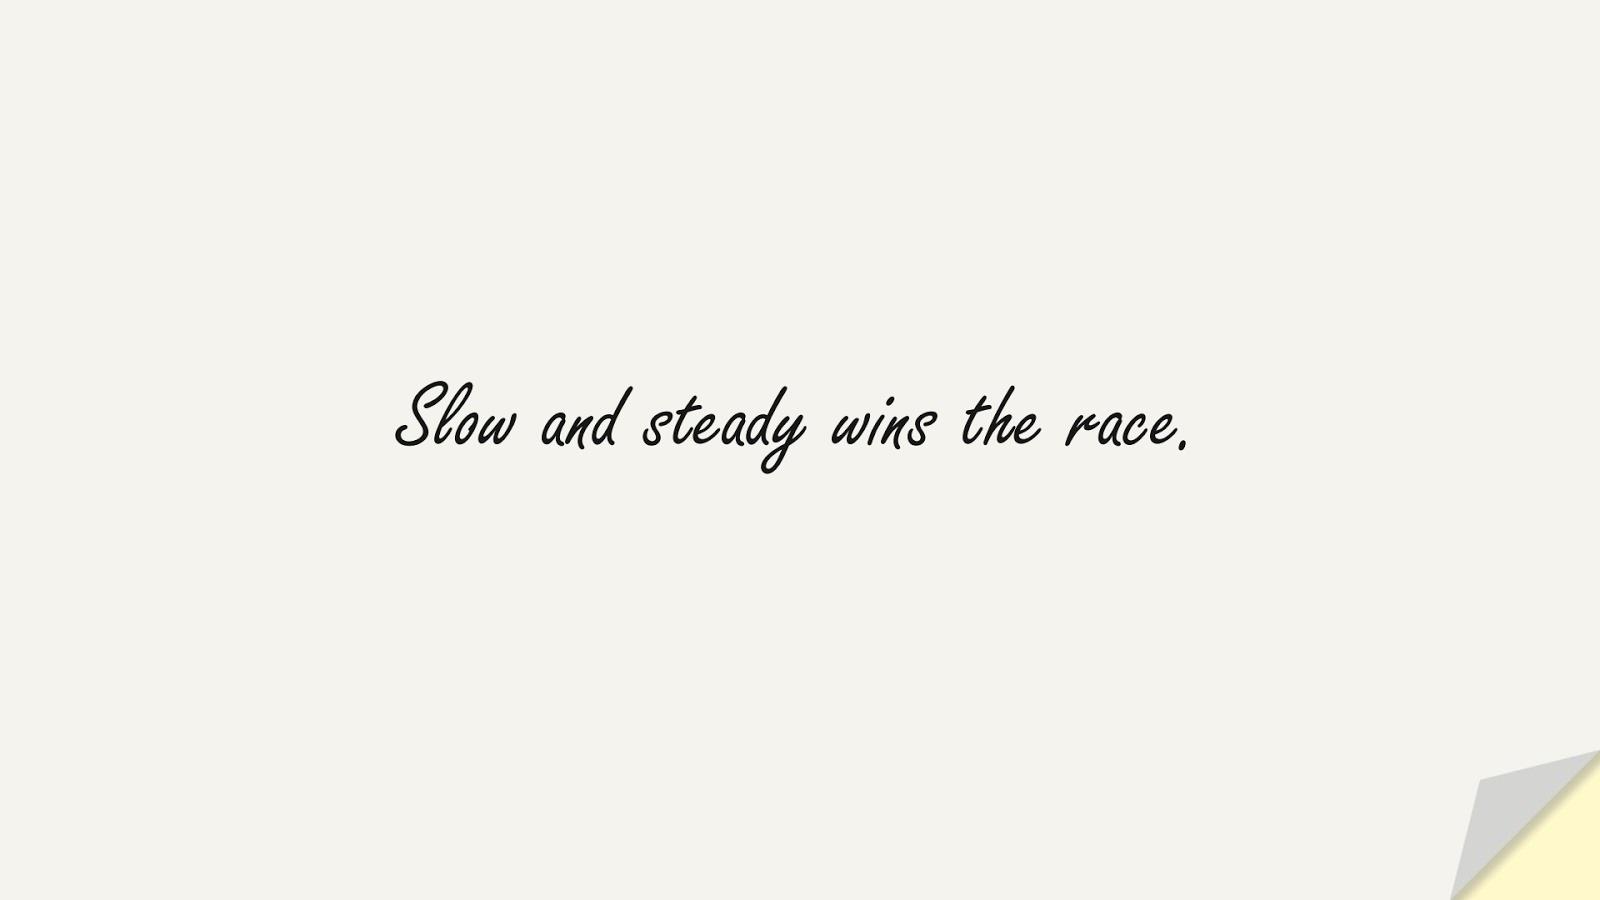 Slow and steady wins the race.FALSE